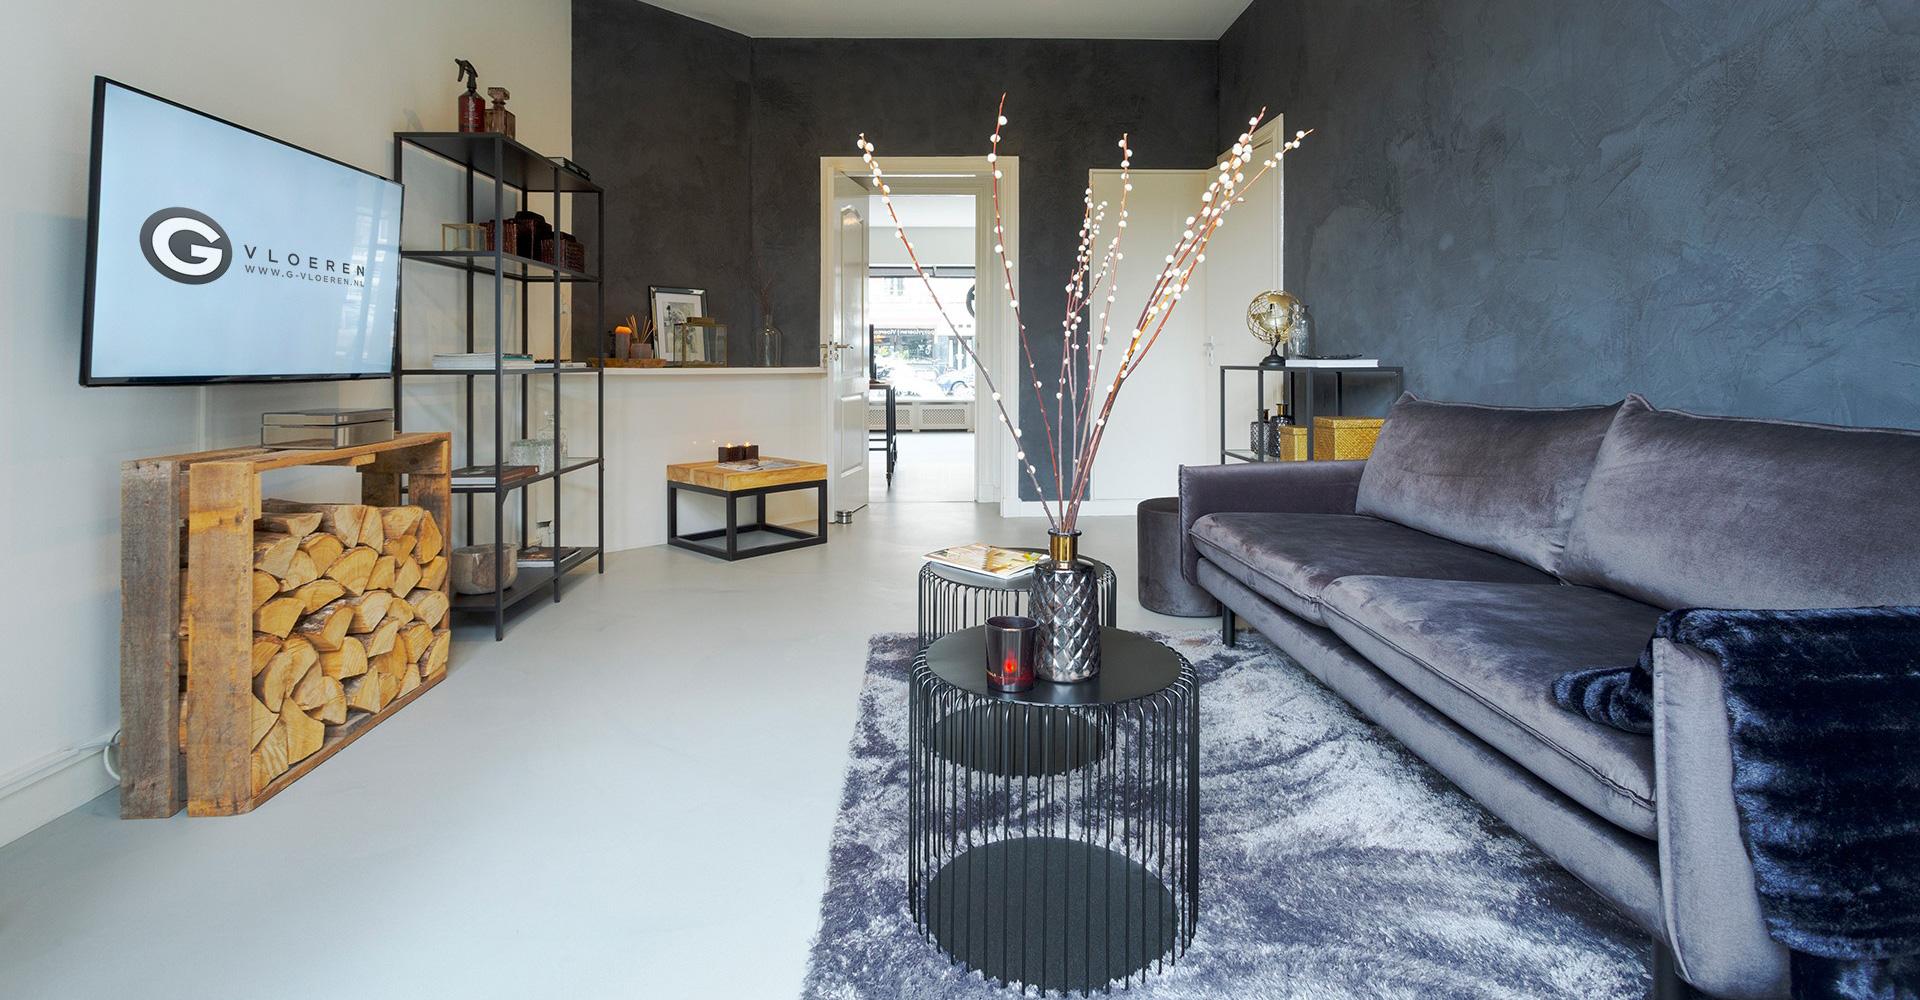 G-vloeren woonbeton showroom